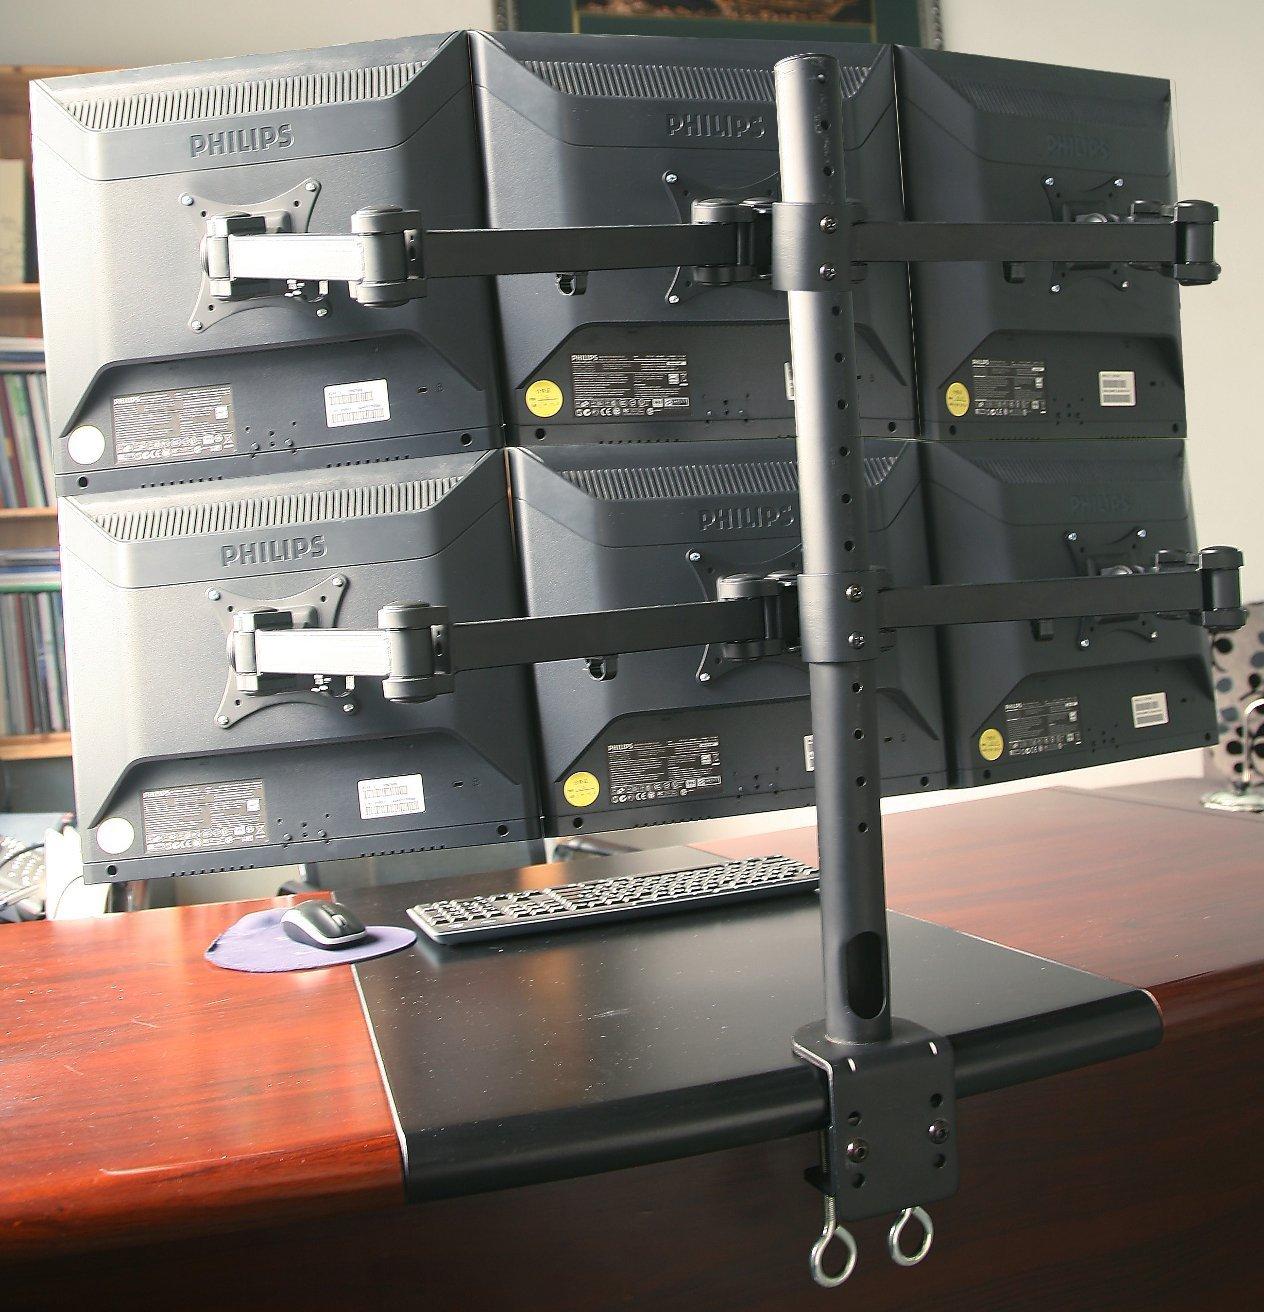 6 Monitor Stand Heavy Duty Desk Mounted Up To 6x 24 Monitors 85 99 Maximum Size Of Vesa